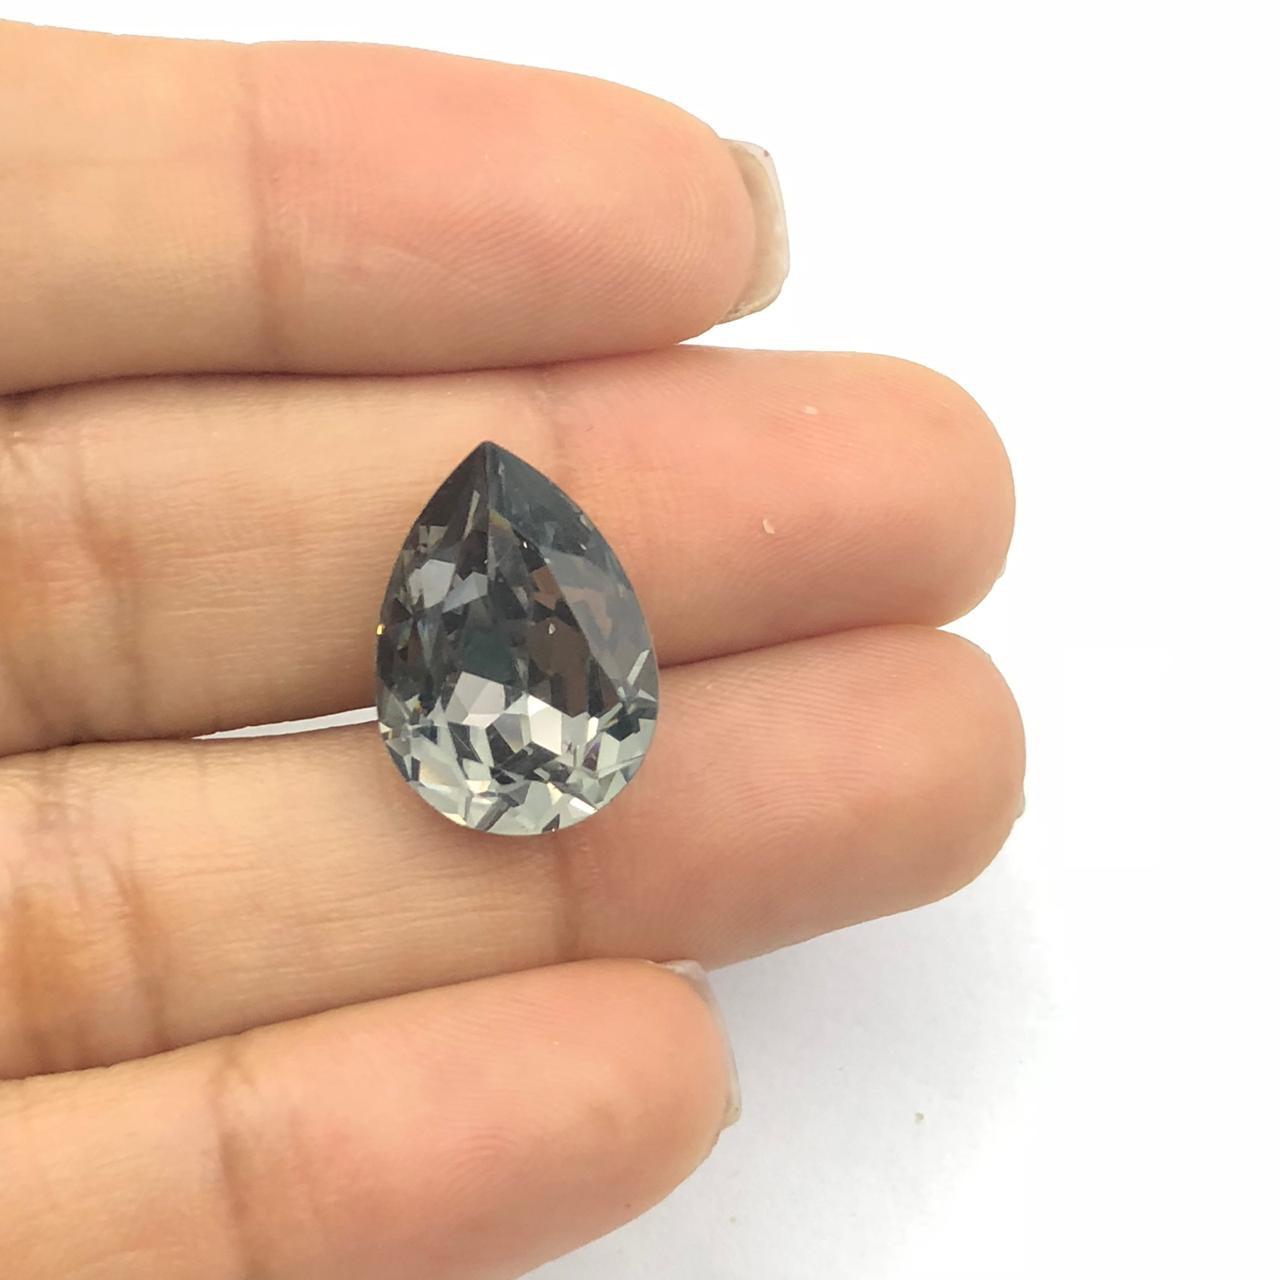 CHT715 - Chaton Gota 13x18 Base Côncava Black Diamond - 2unids